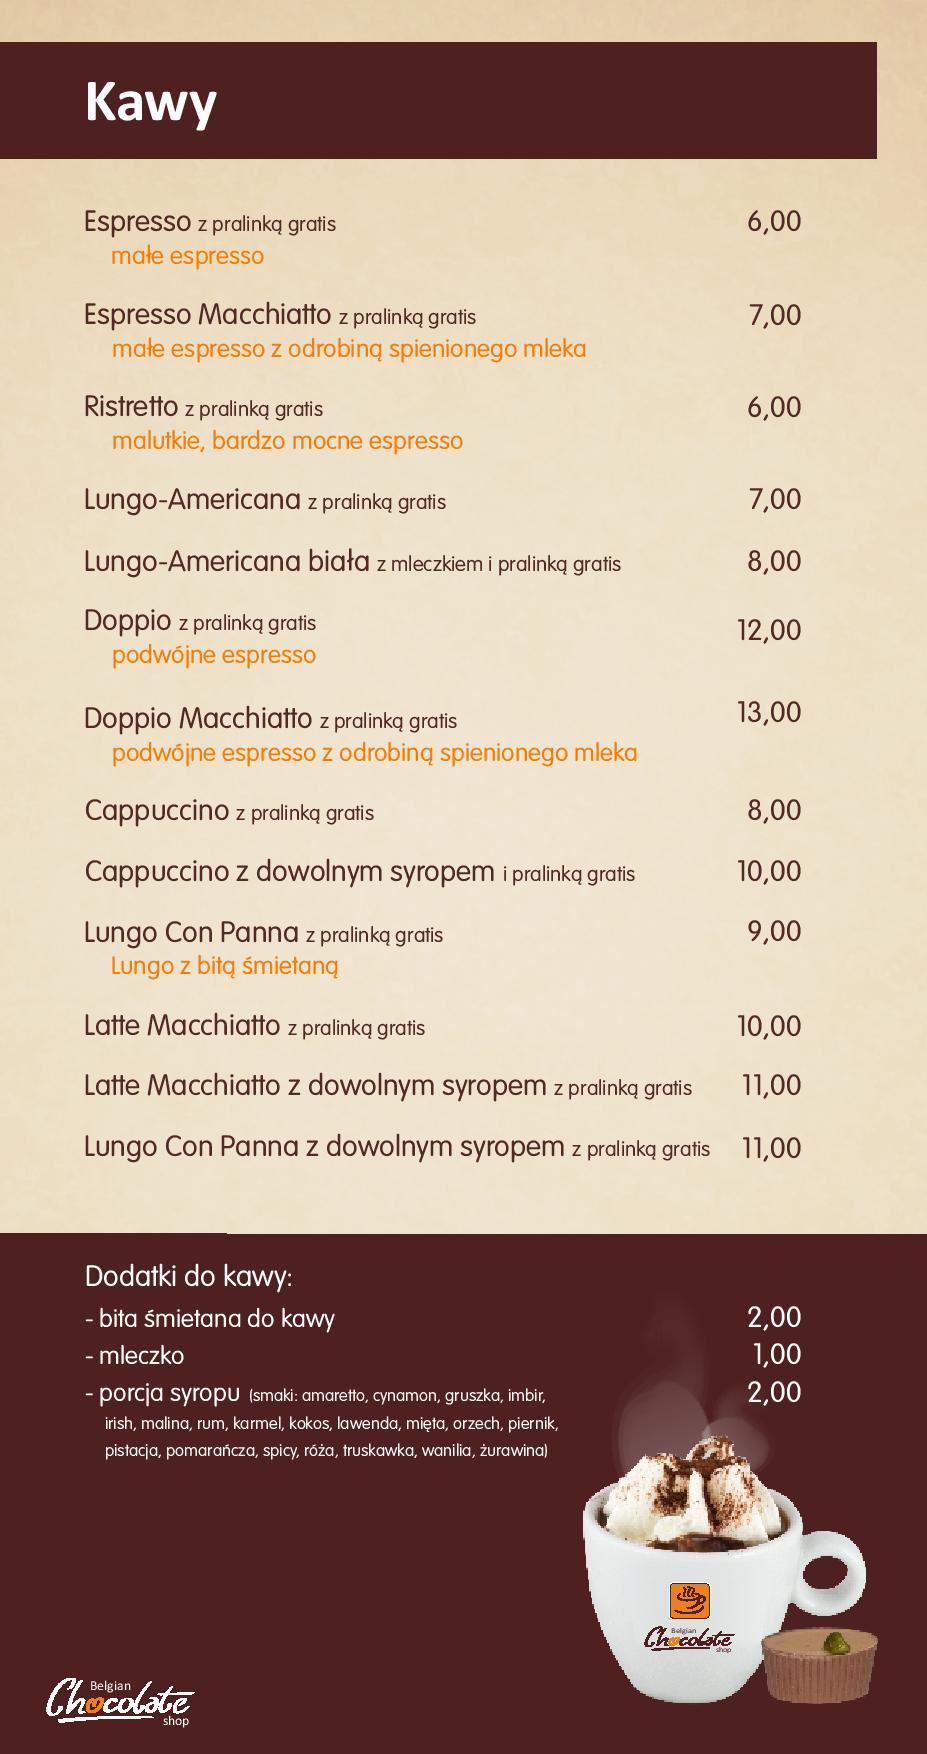 2015-03 Belgian Chocolate Shop Nowe Menu w3b-page-008